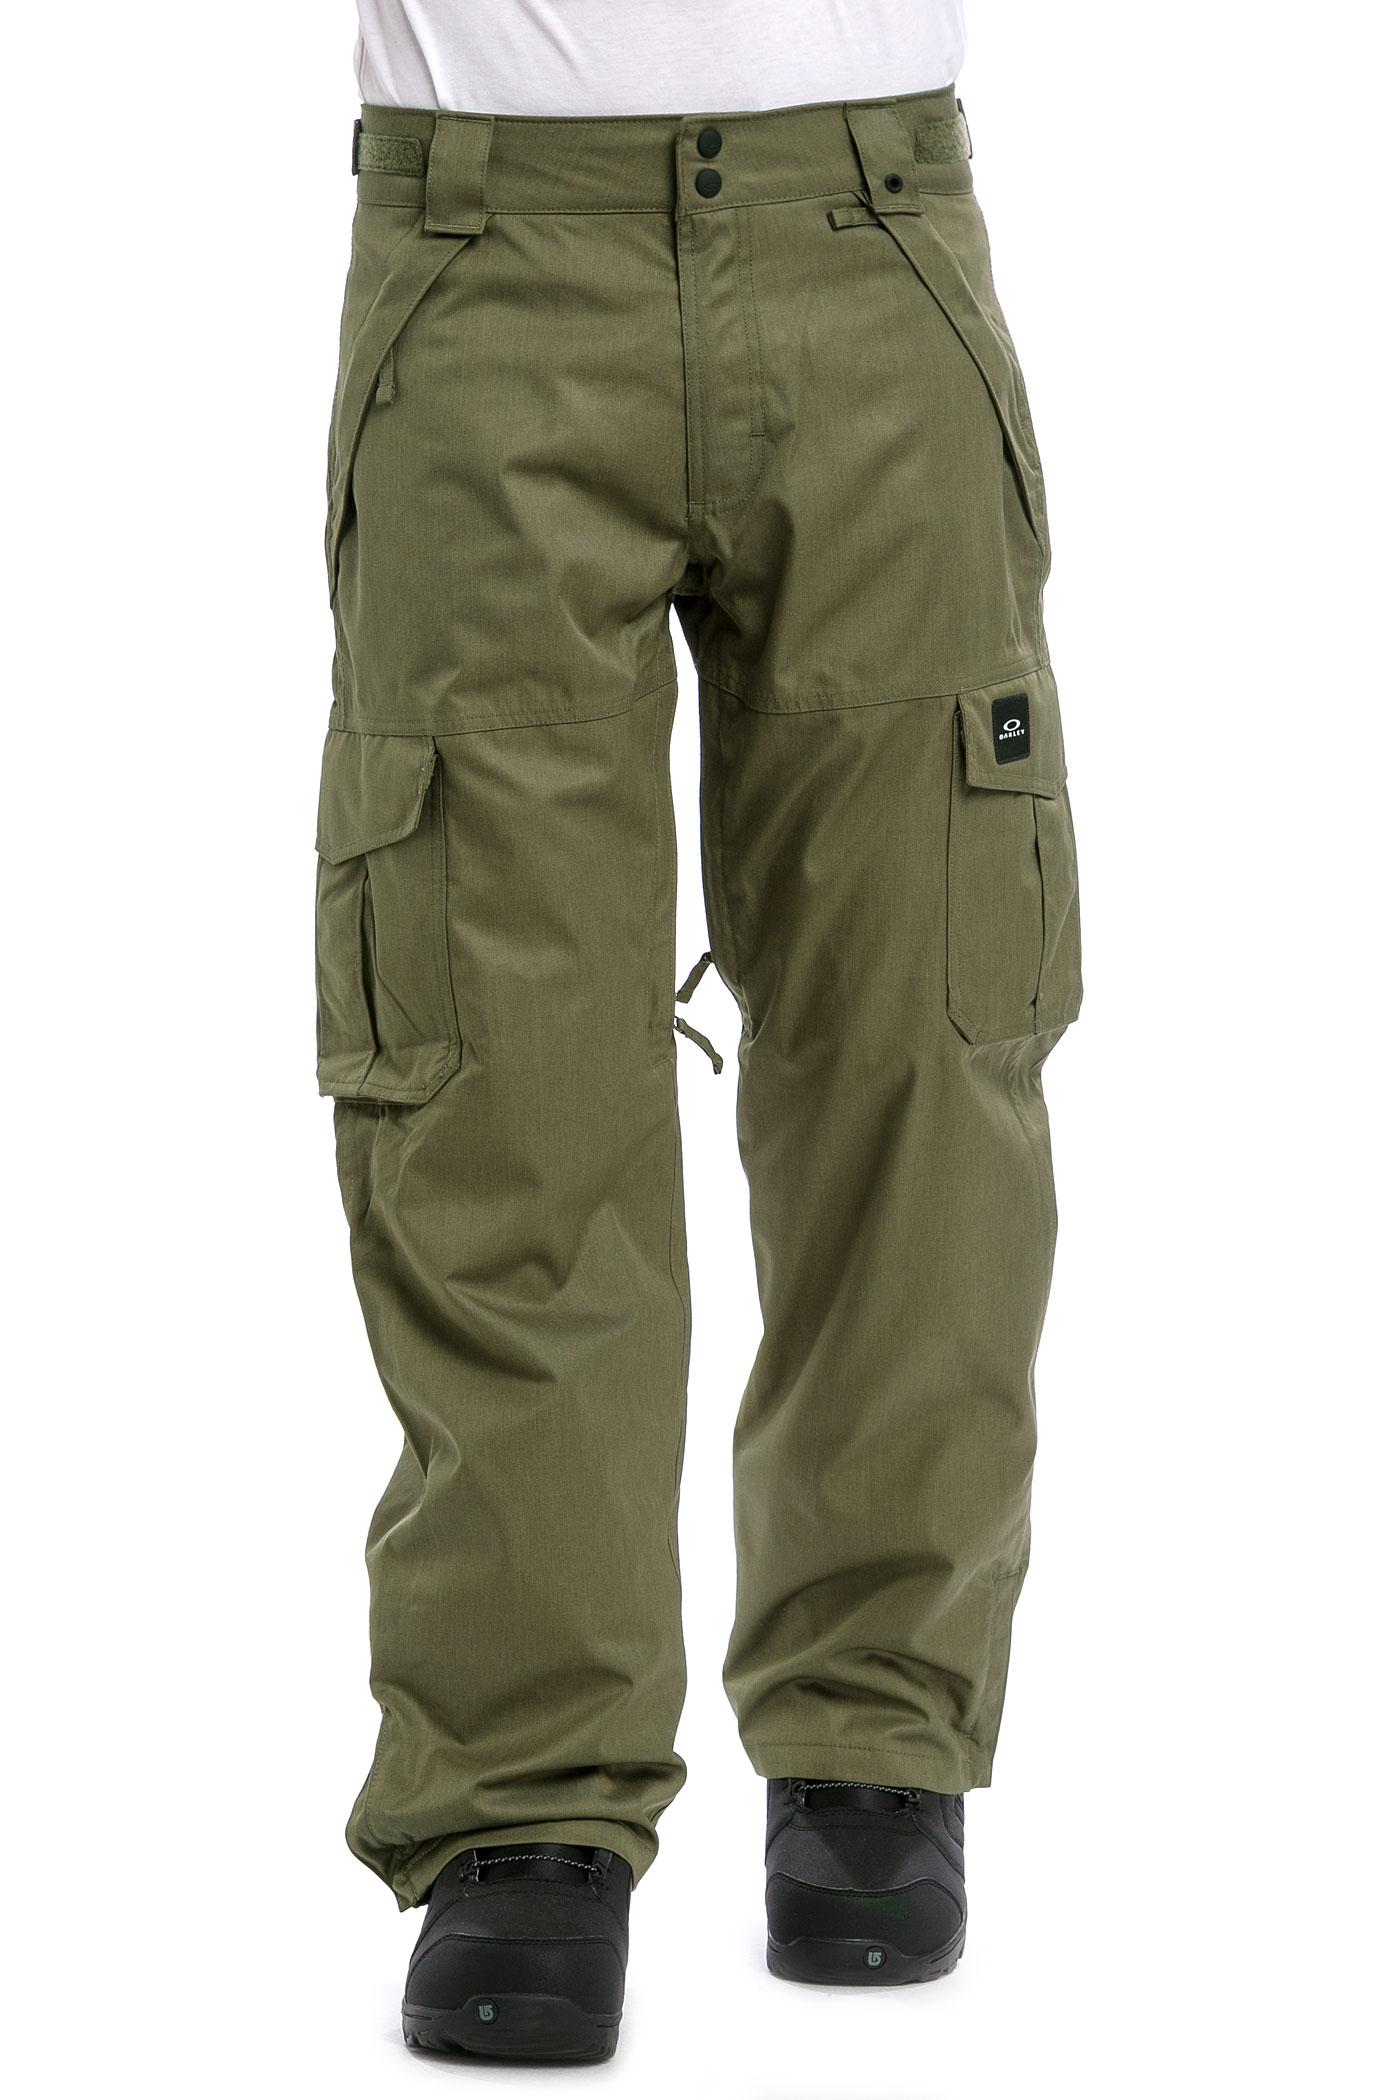 cd3c49457a Oakley Arrowhead Biozone Snowboard Pant (dark brush) buy at skatedeluxe